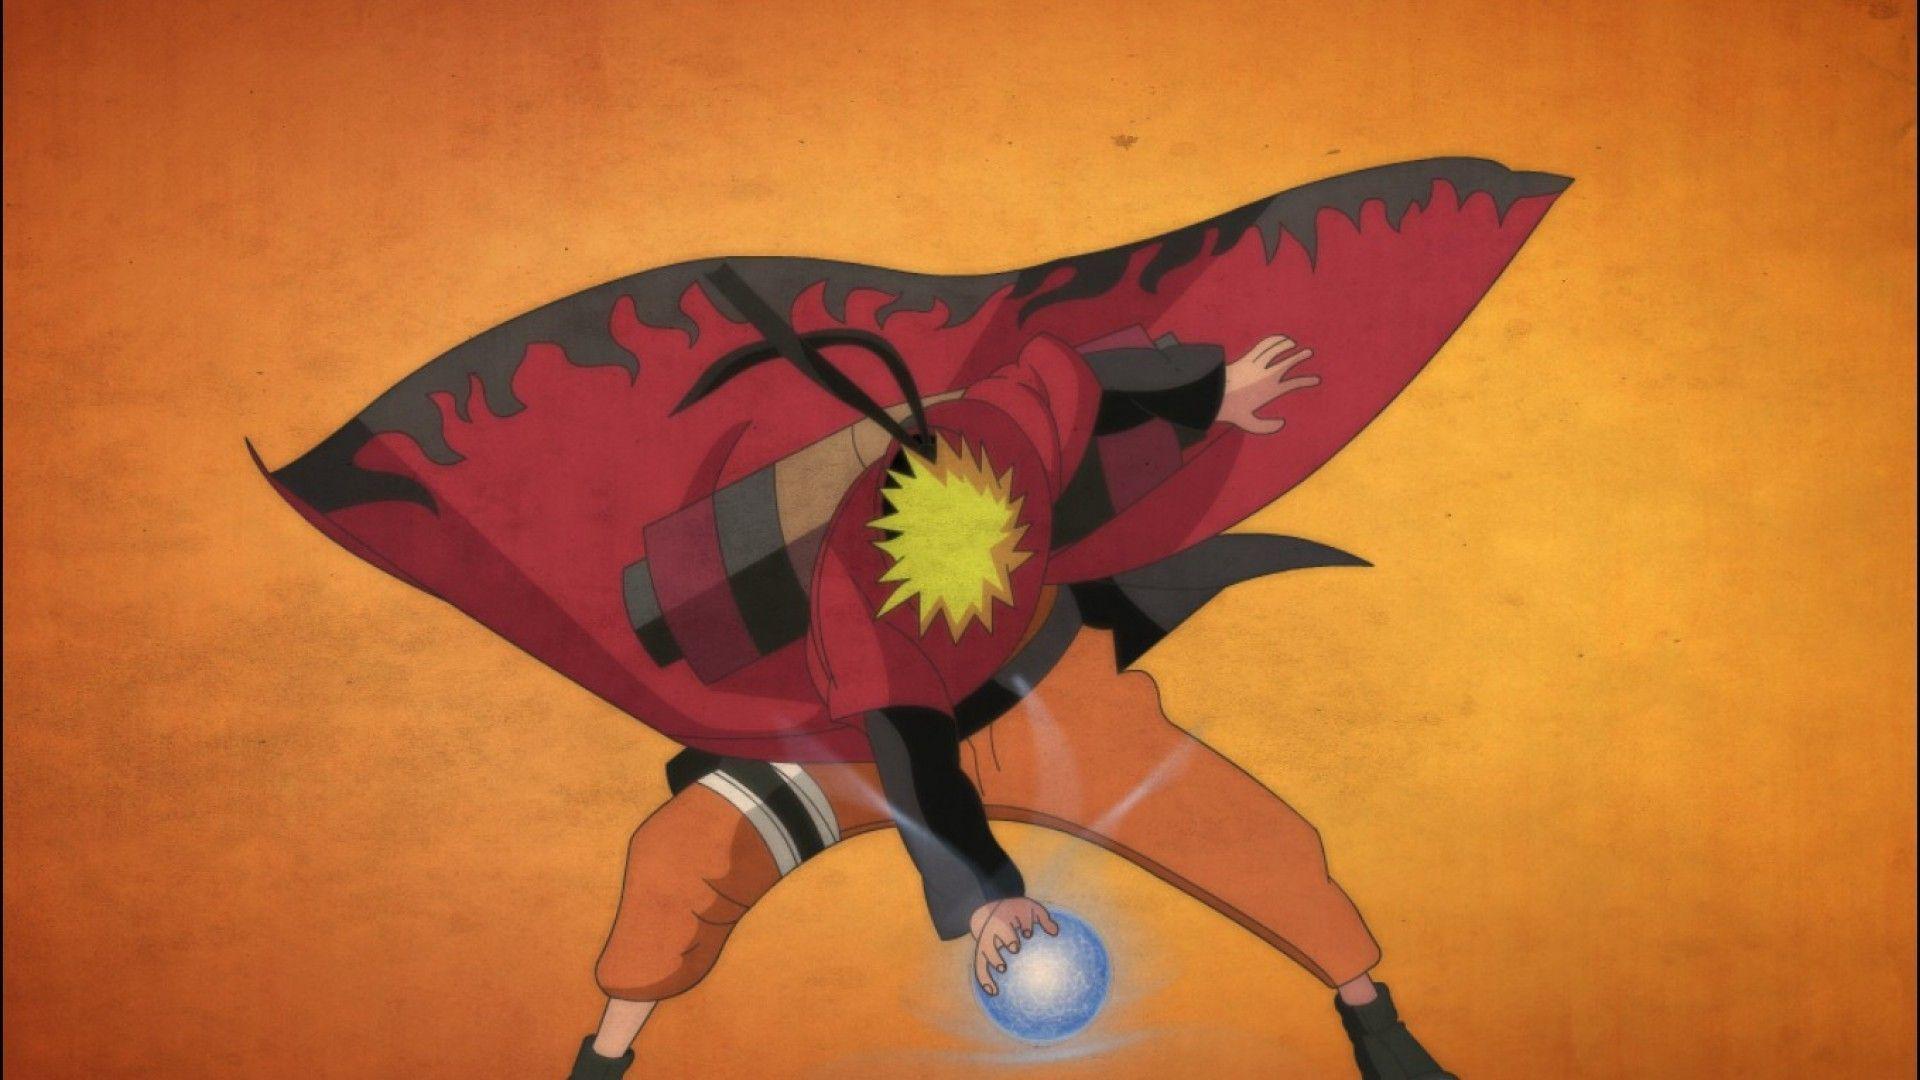 Uzumaki Naruto Sage Mode Wallpaper Hd Posted By Ryan Simpson